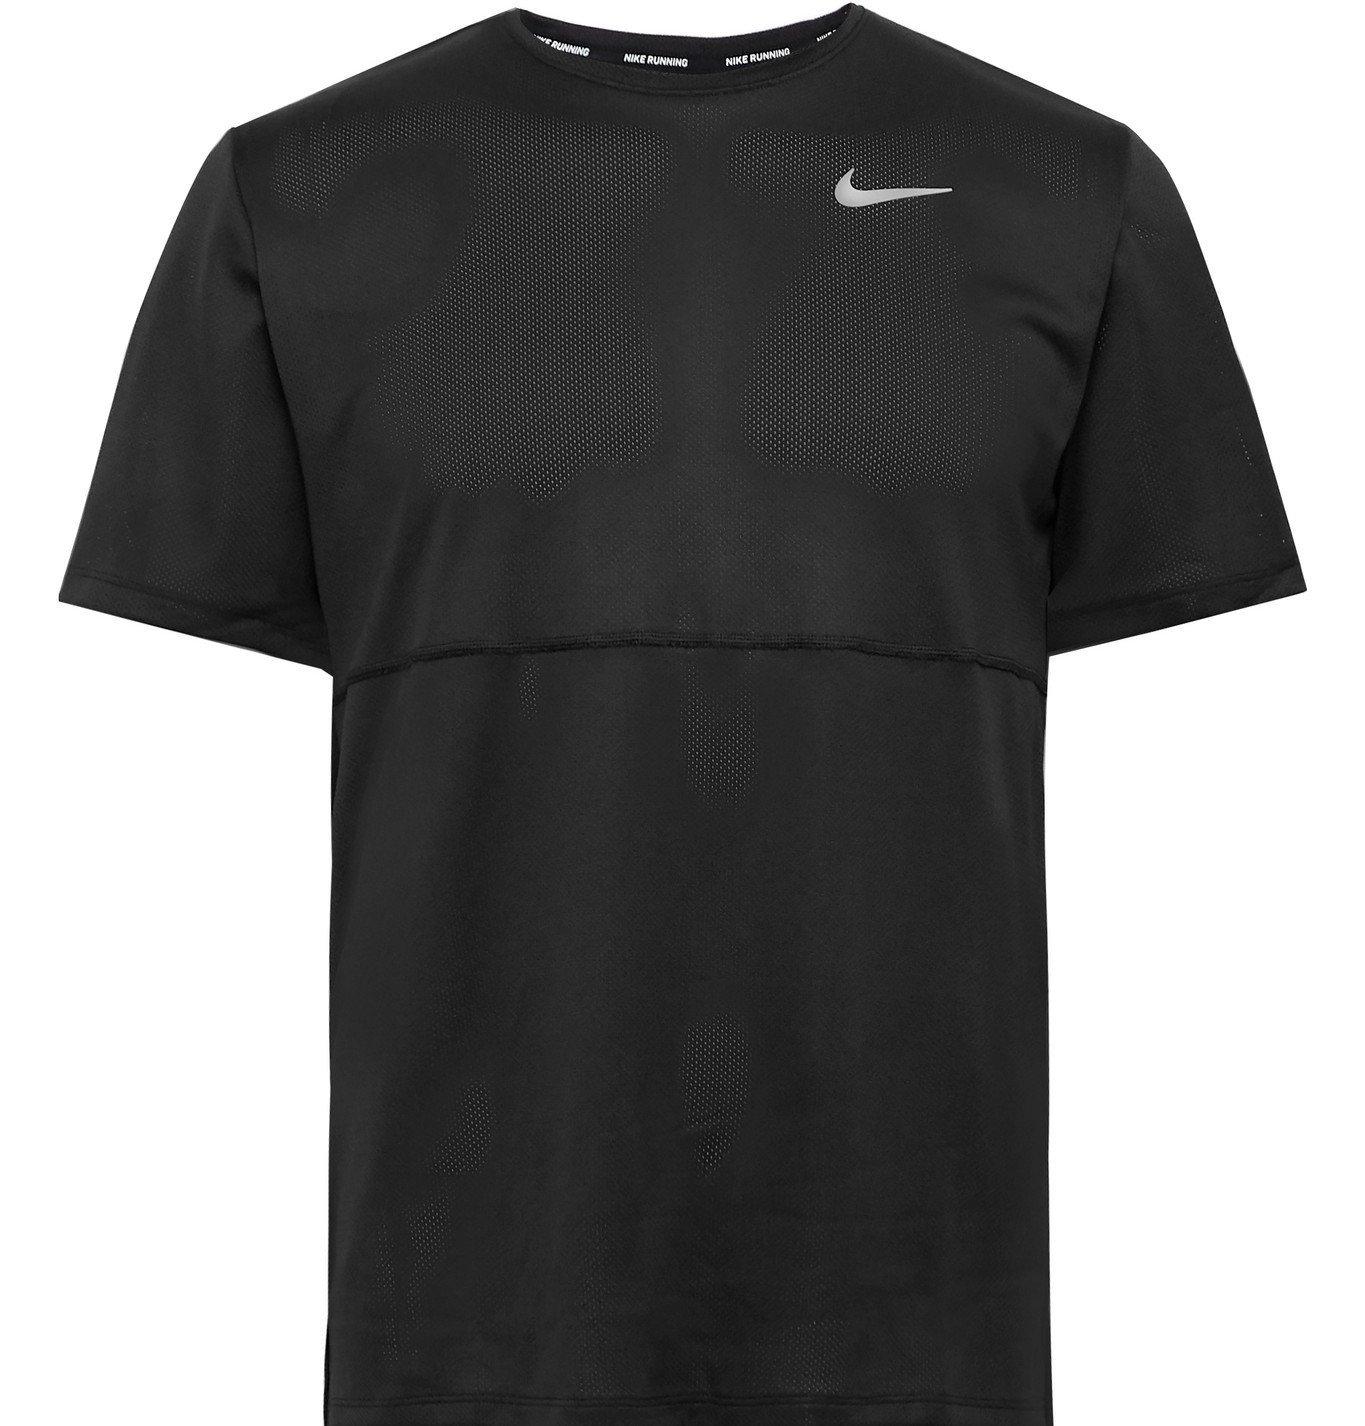 Nike Running - Breathe Dri-FIT Mesh T-Shirt - Black